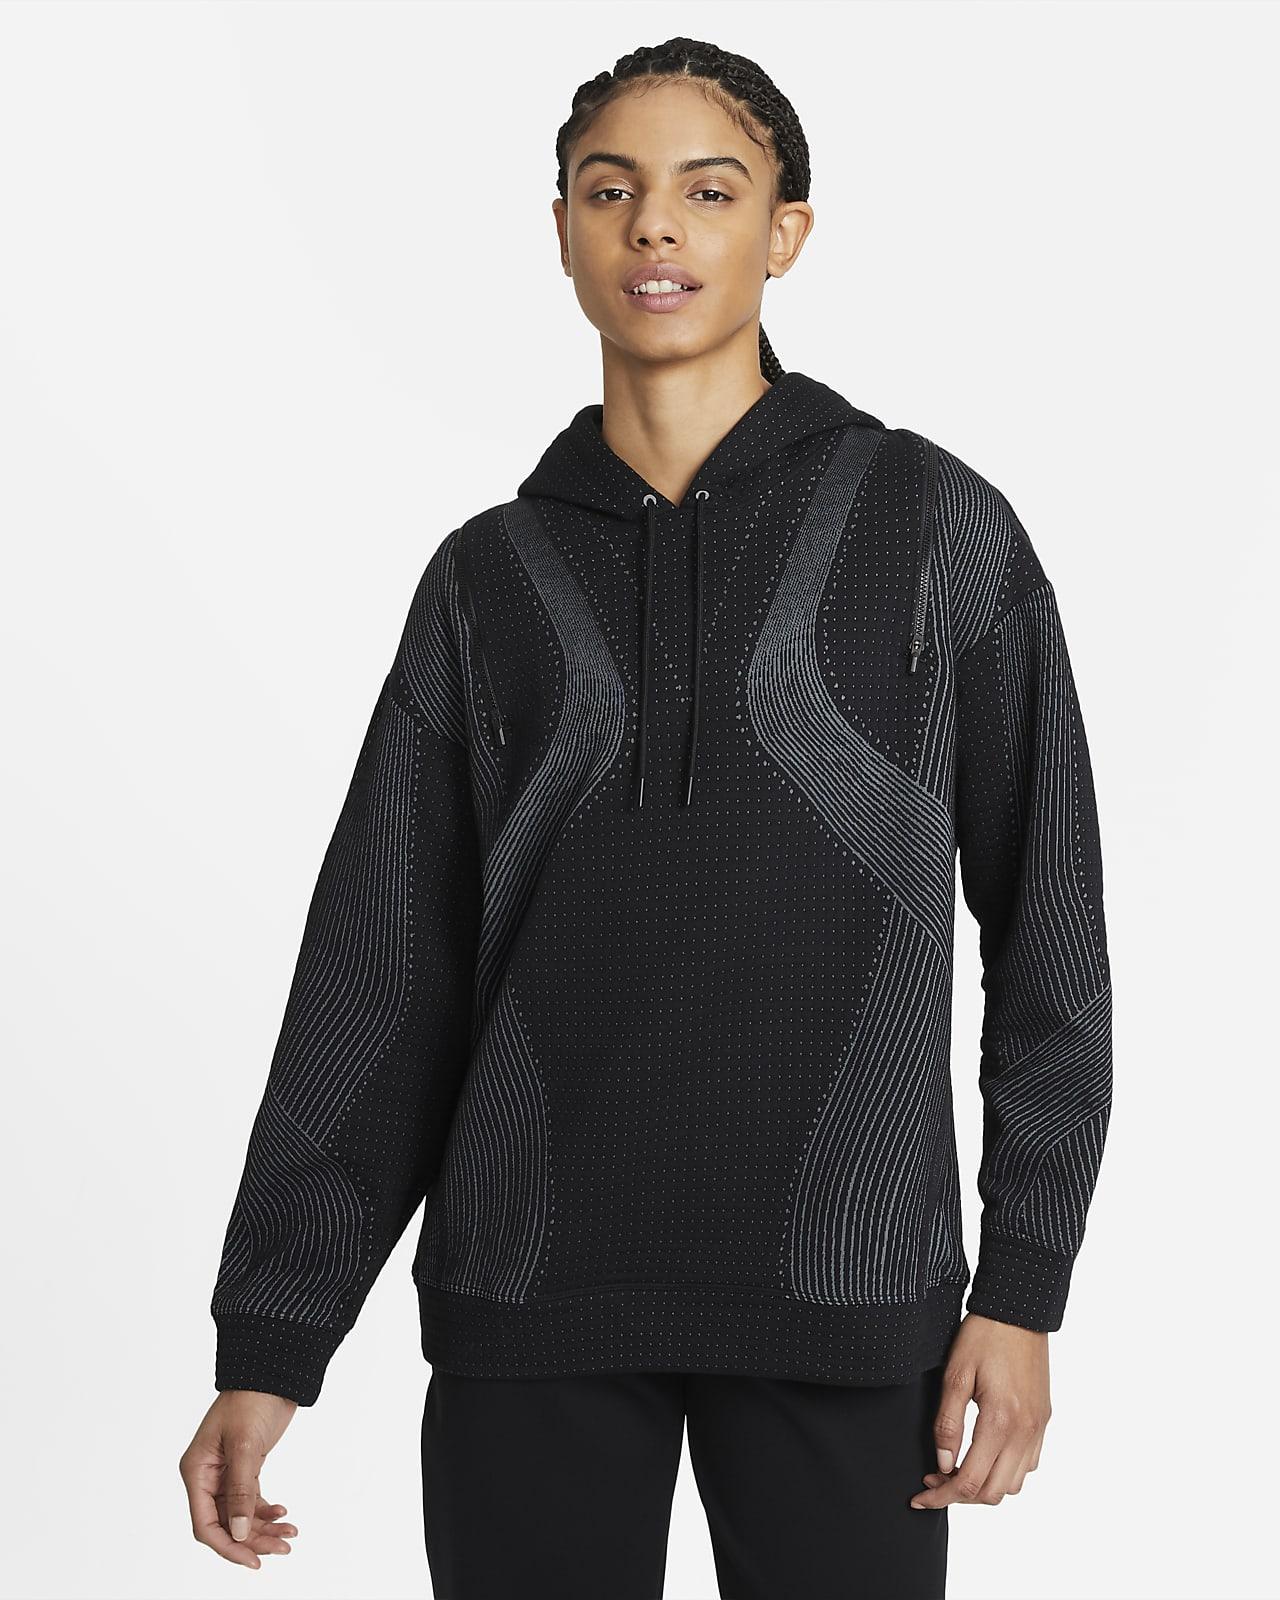 Damska bluza treningowa z kapturem Nike City Ready